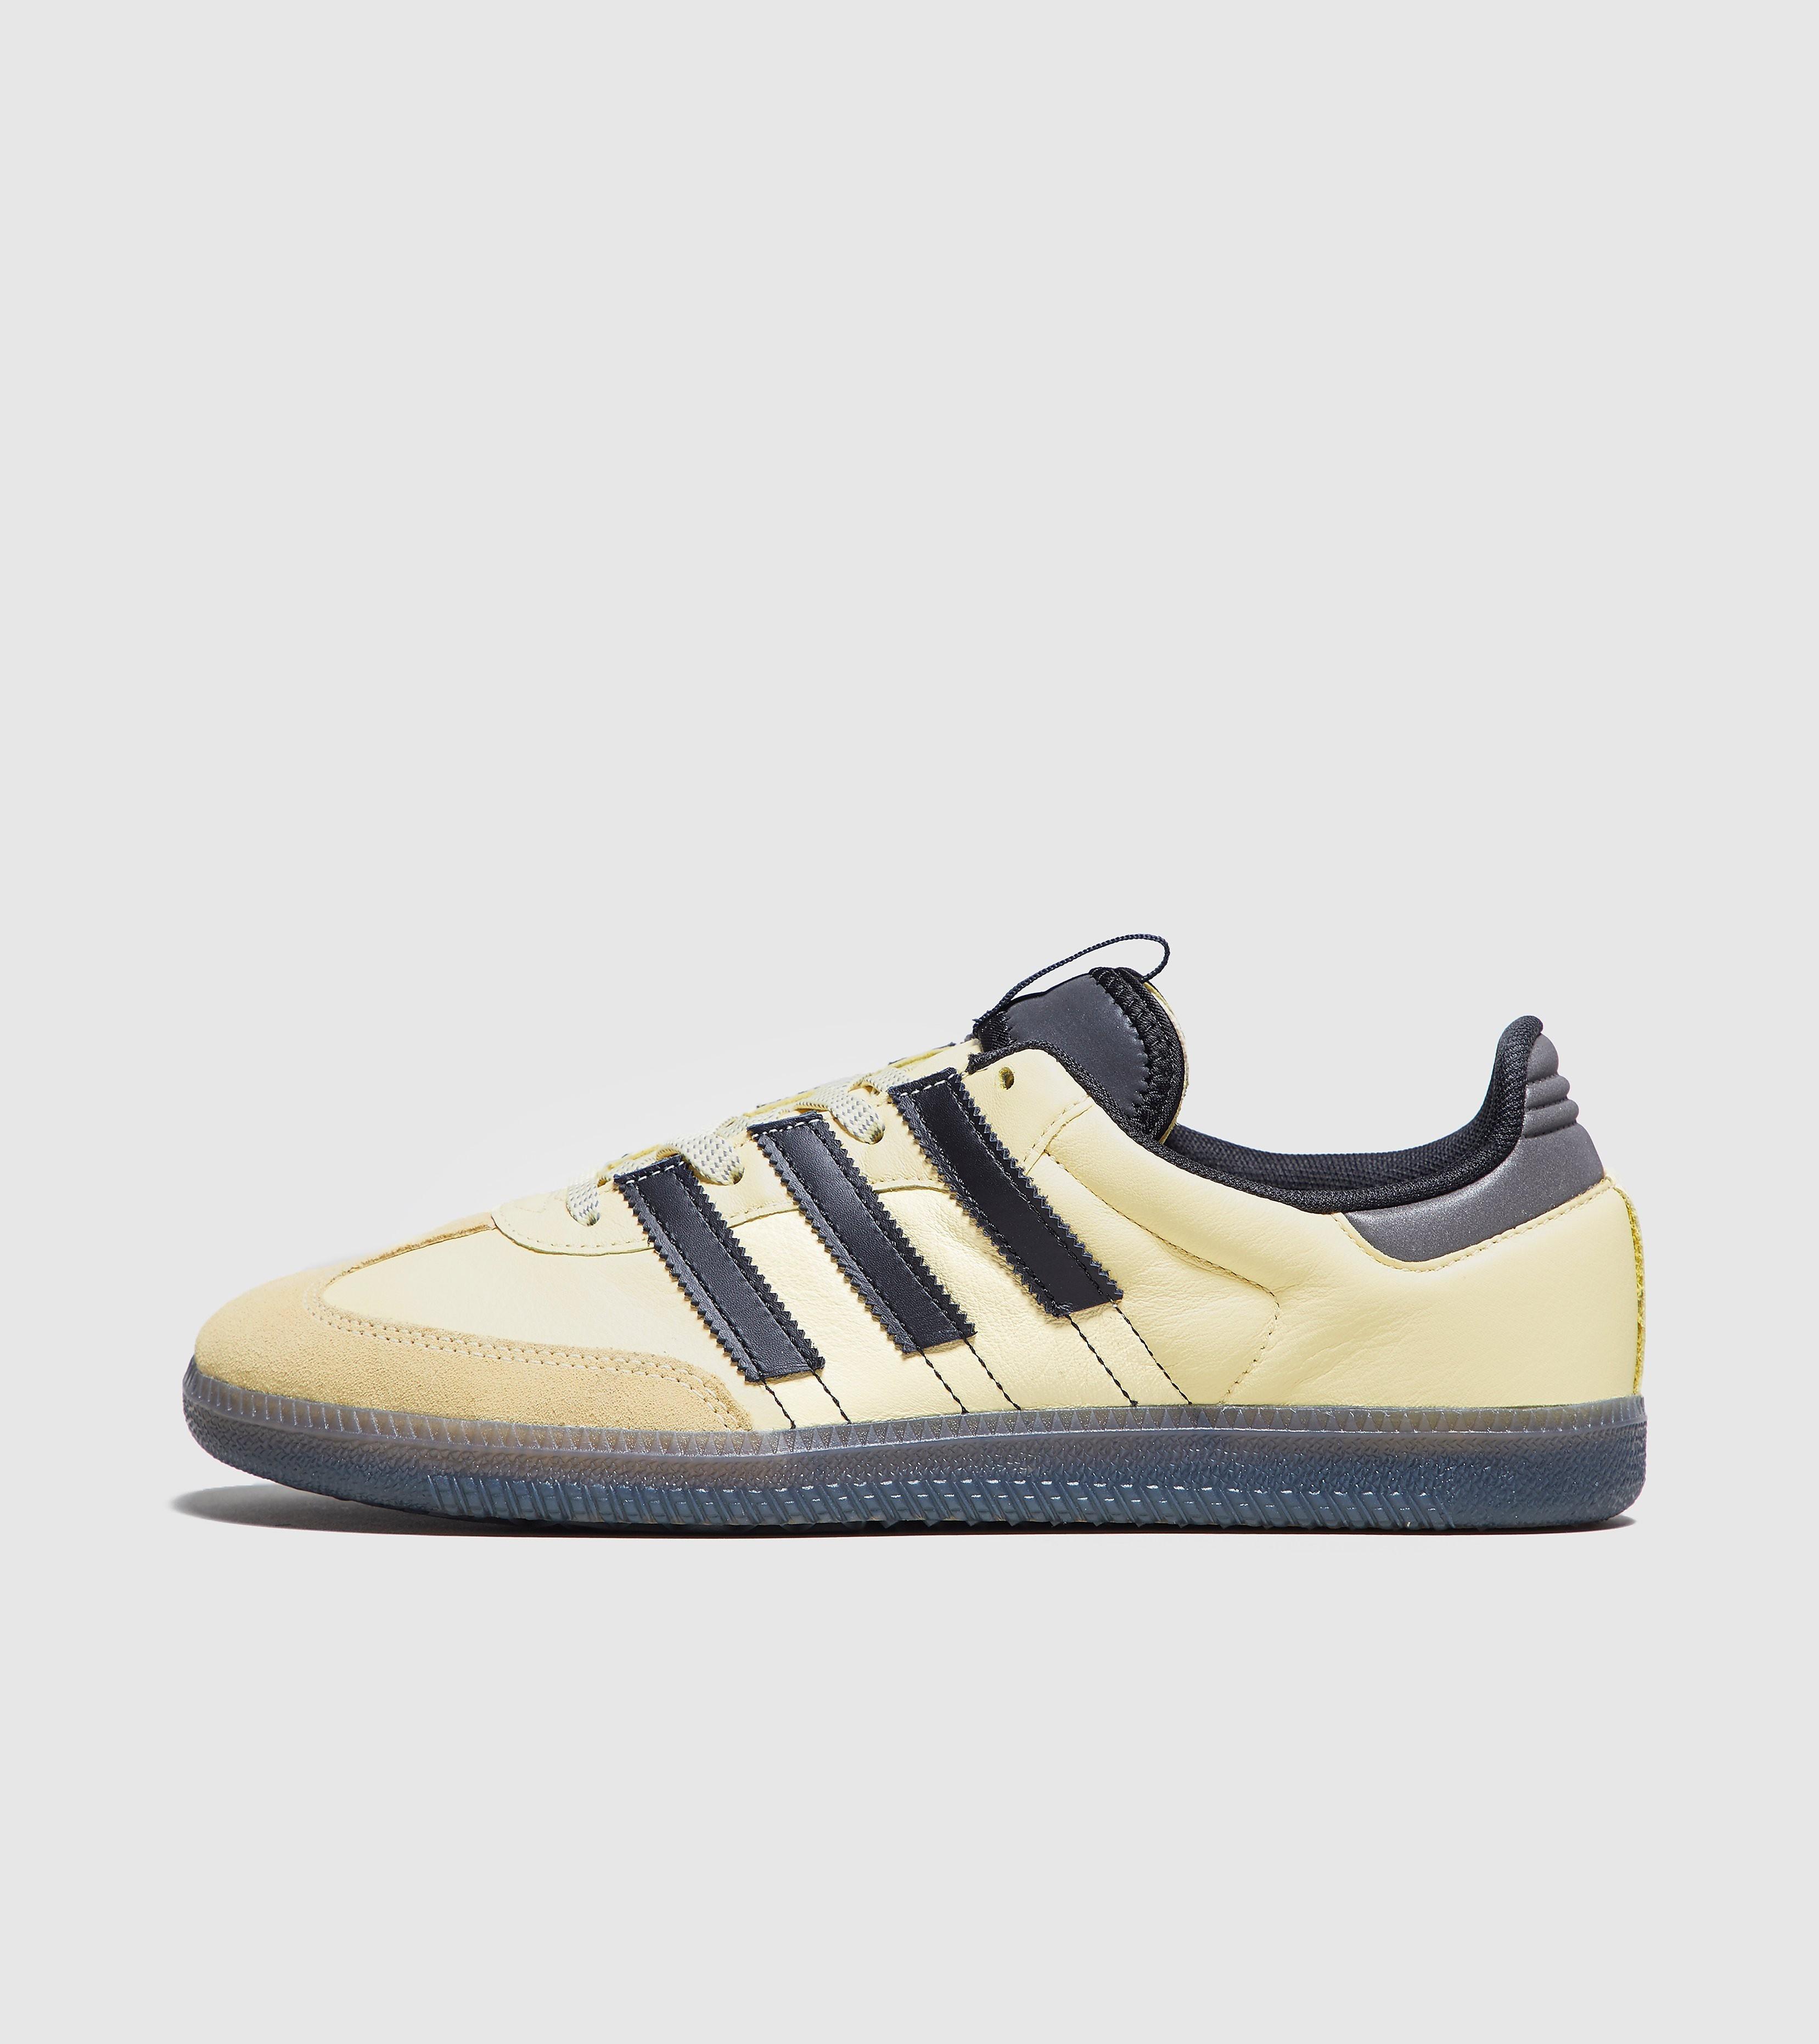 adidas Originals Cuero Adidas Samba Og Ms Easyel Core Black